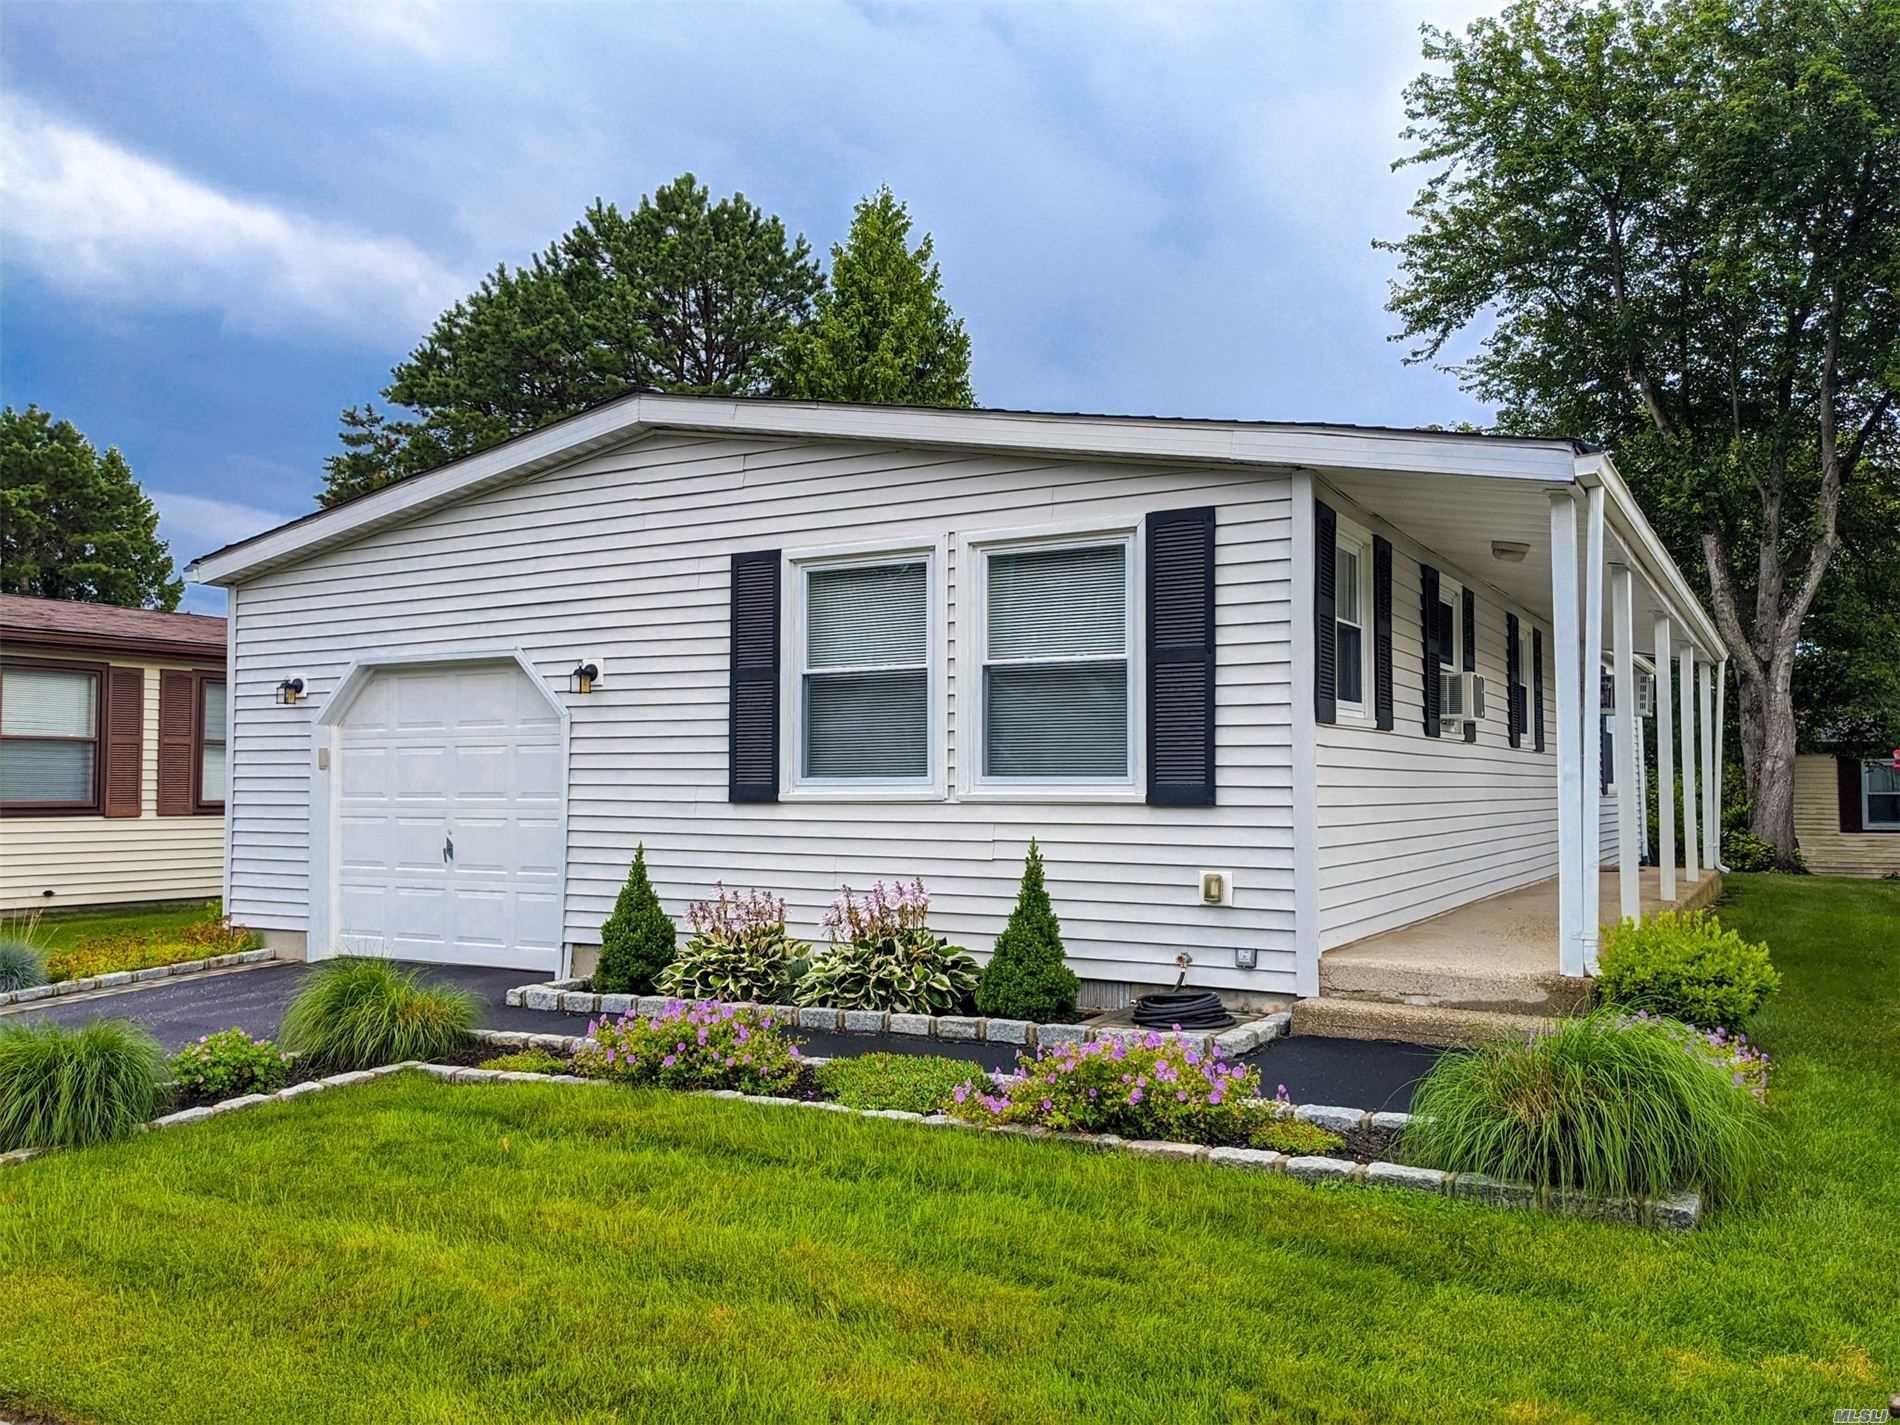 16 Village Circle, Manorville, NY 11949 - MLS#: 3236896